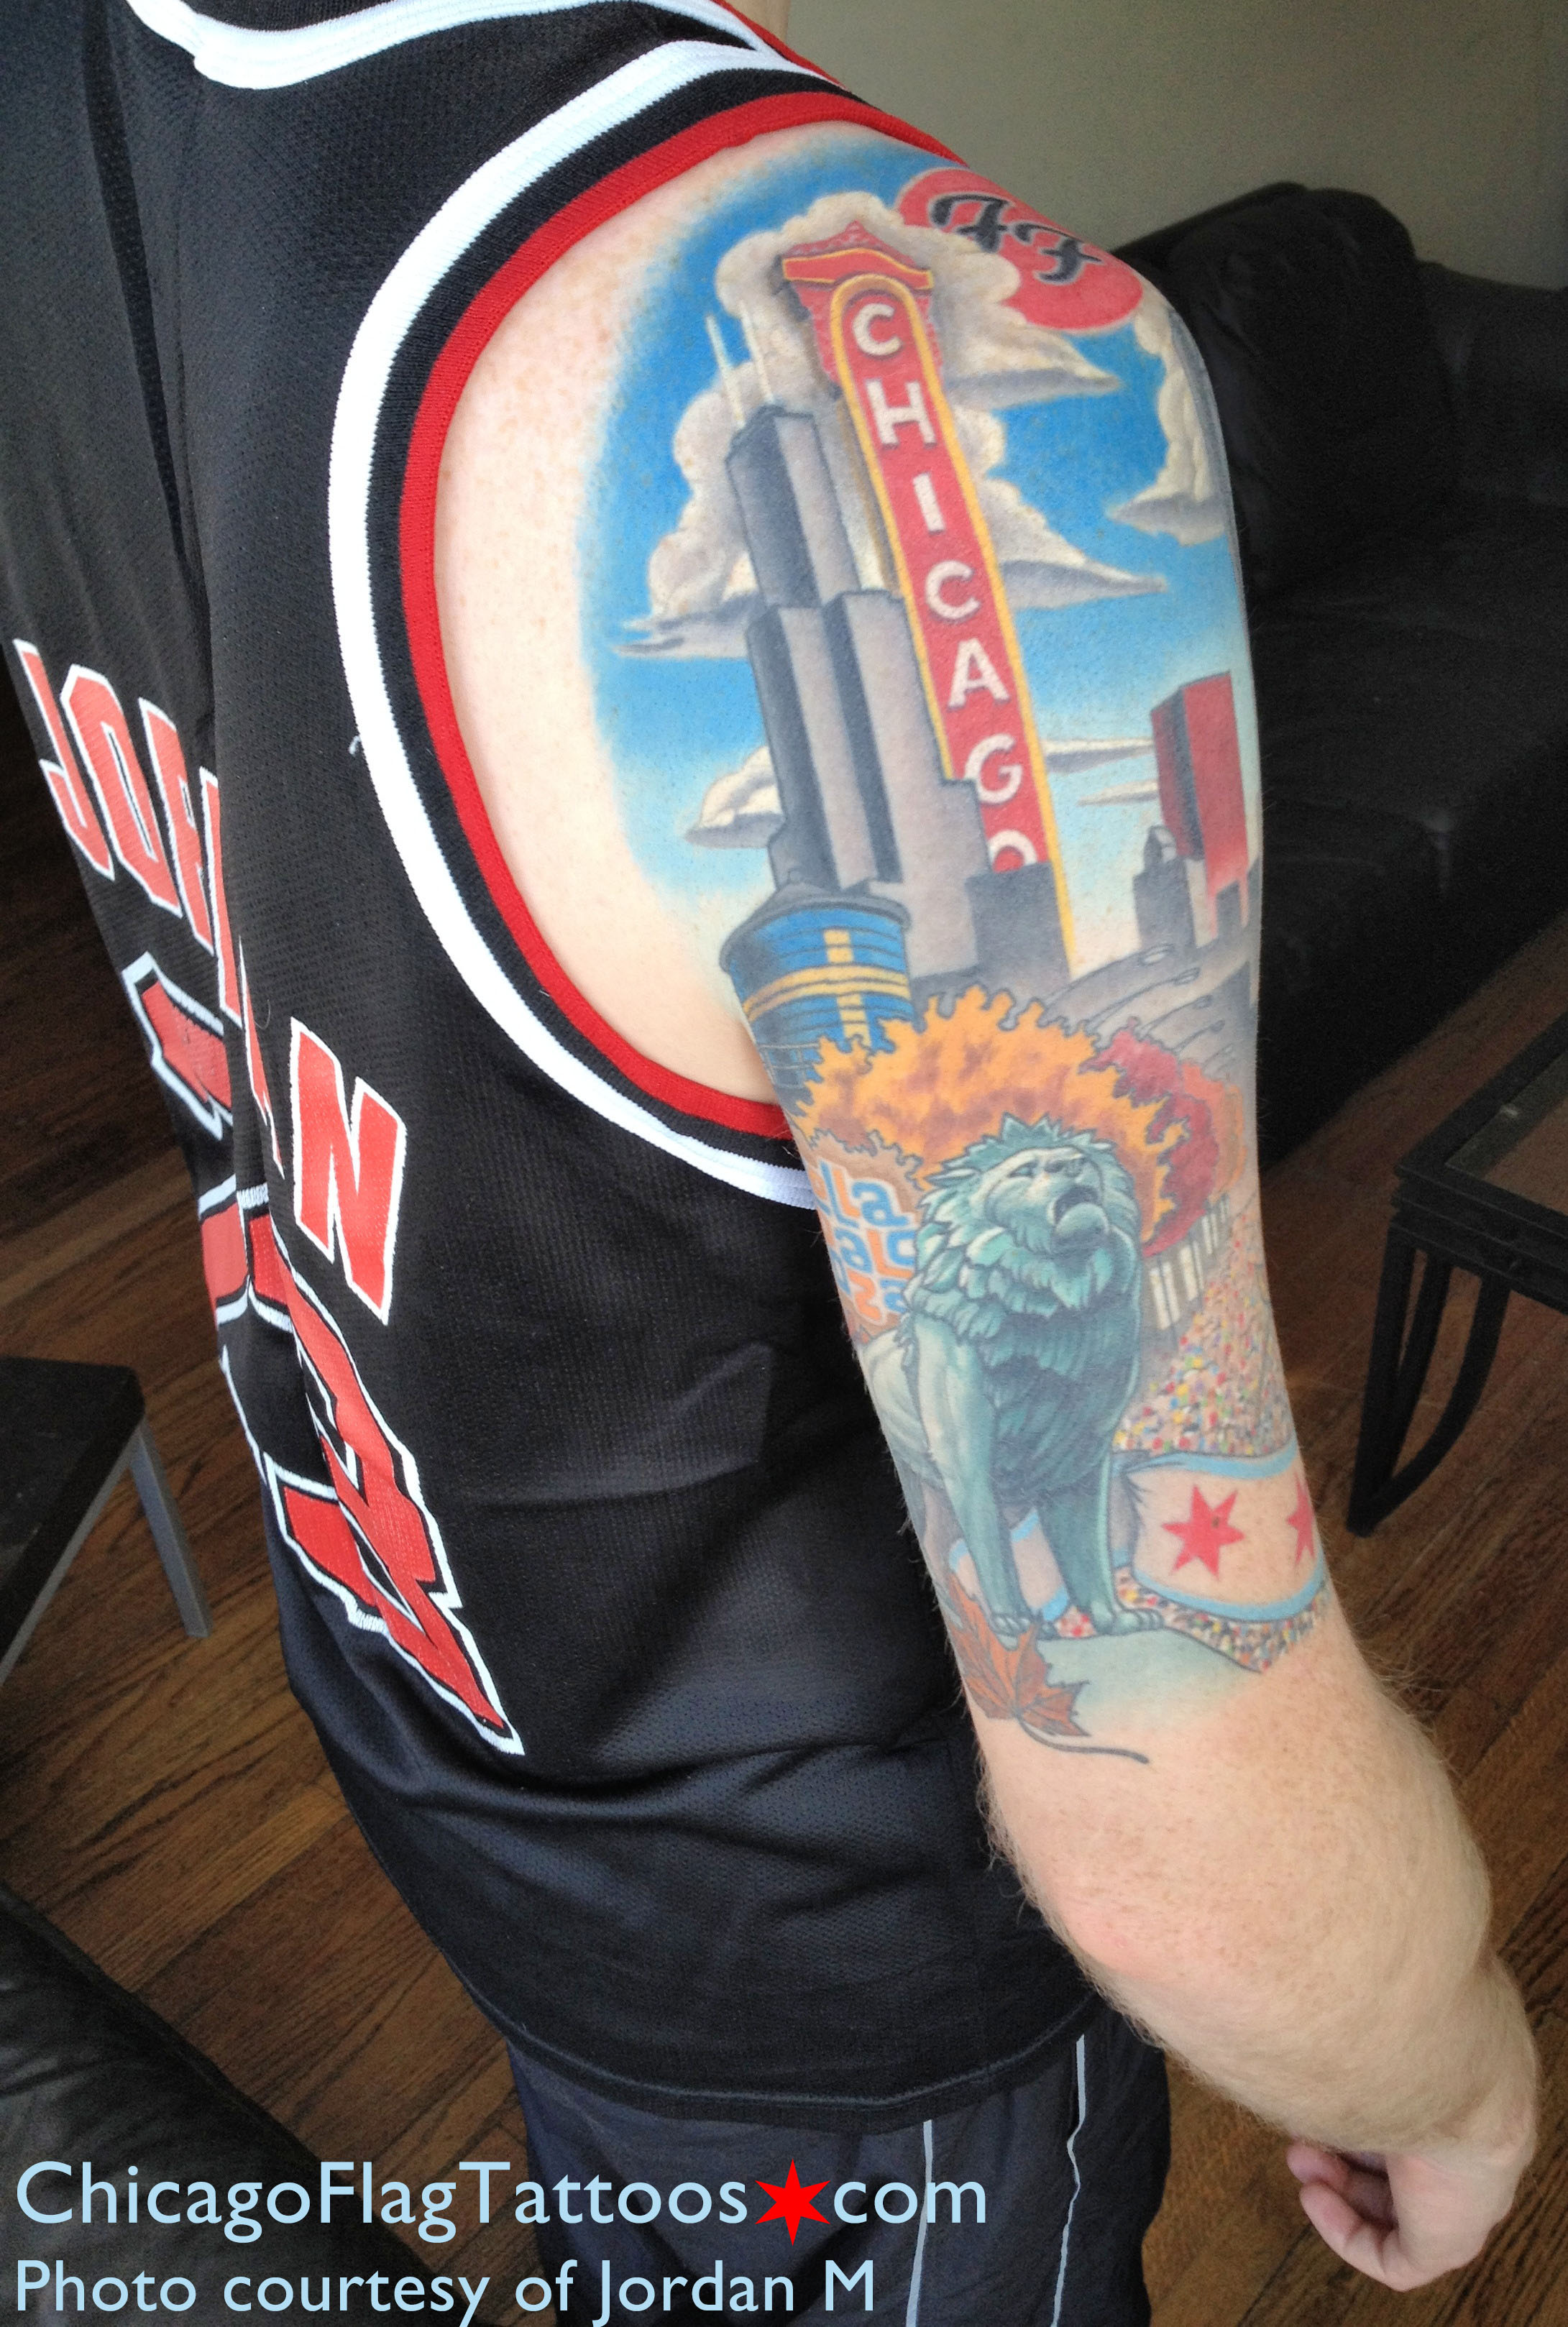 http://chicagoflagtattoos.com/img/jordan-m-2.jpg